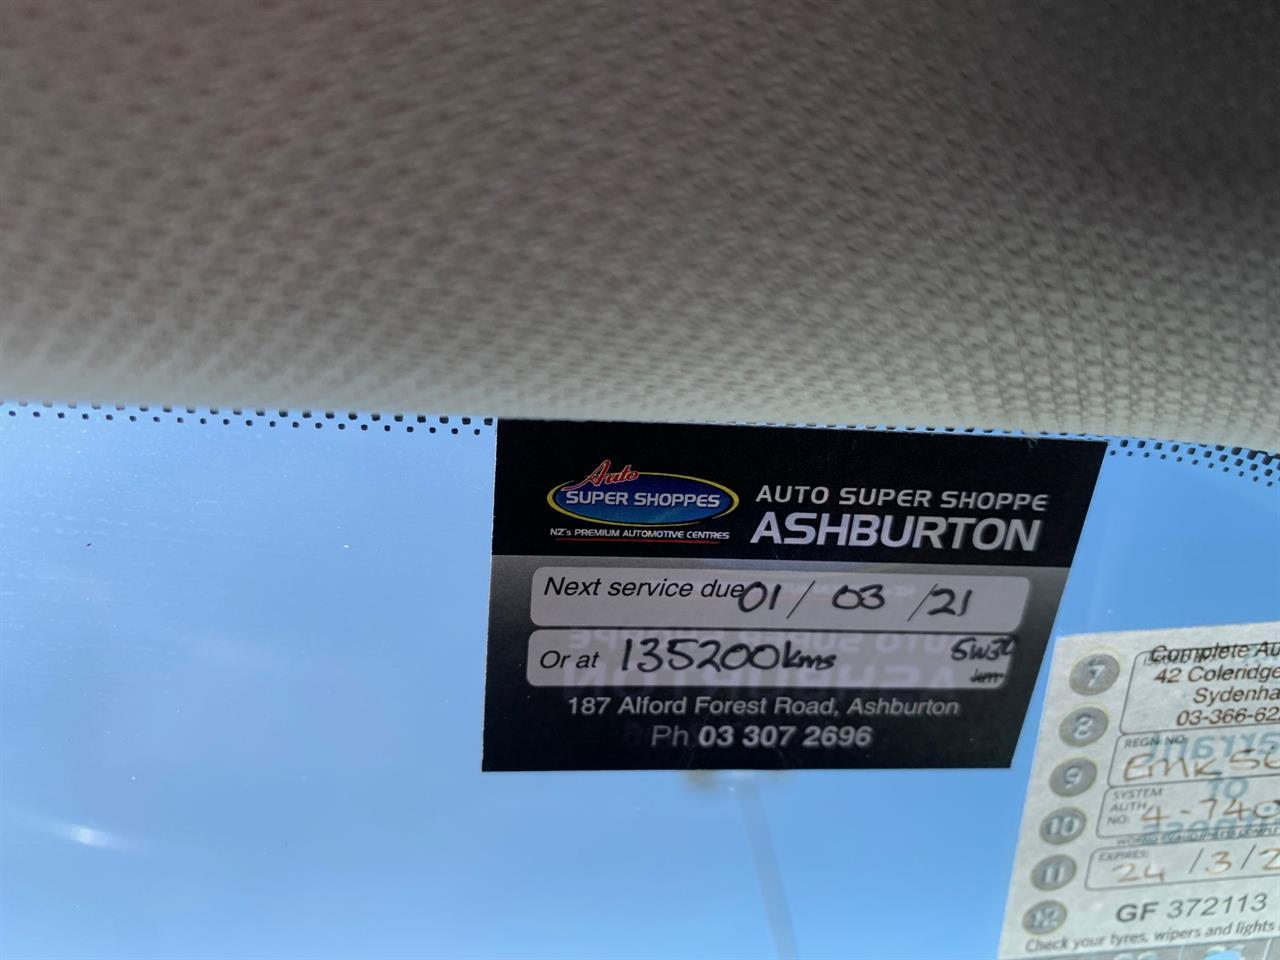 image-9, 2008 Audi A4 2.7 TDI V6 Sedan at Christchurch